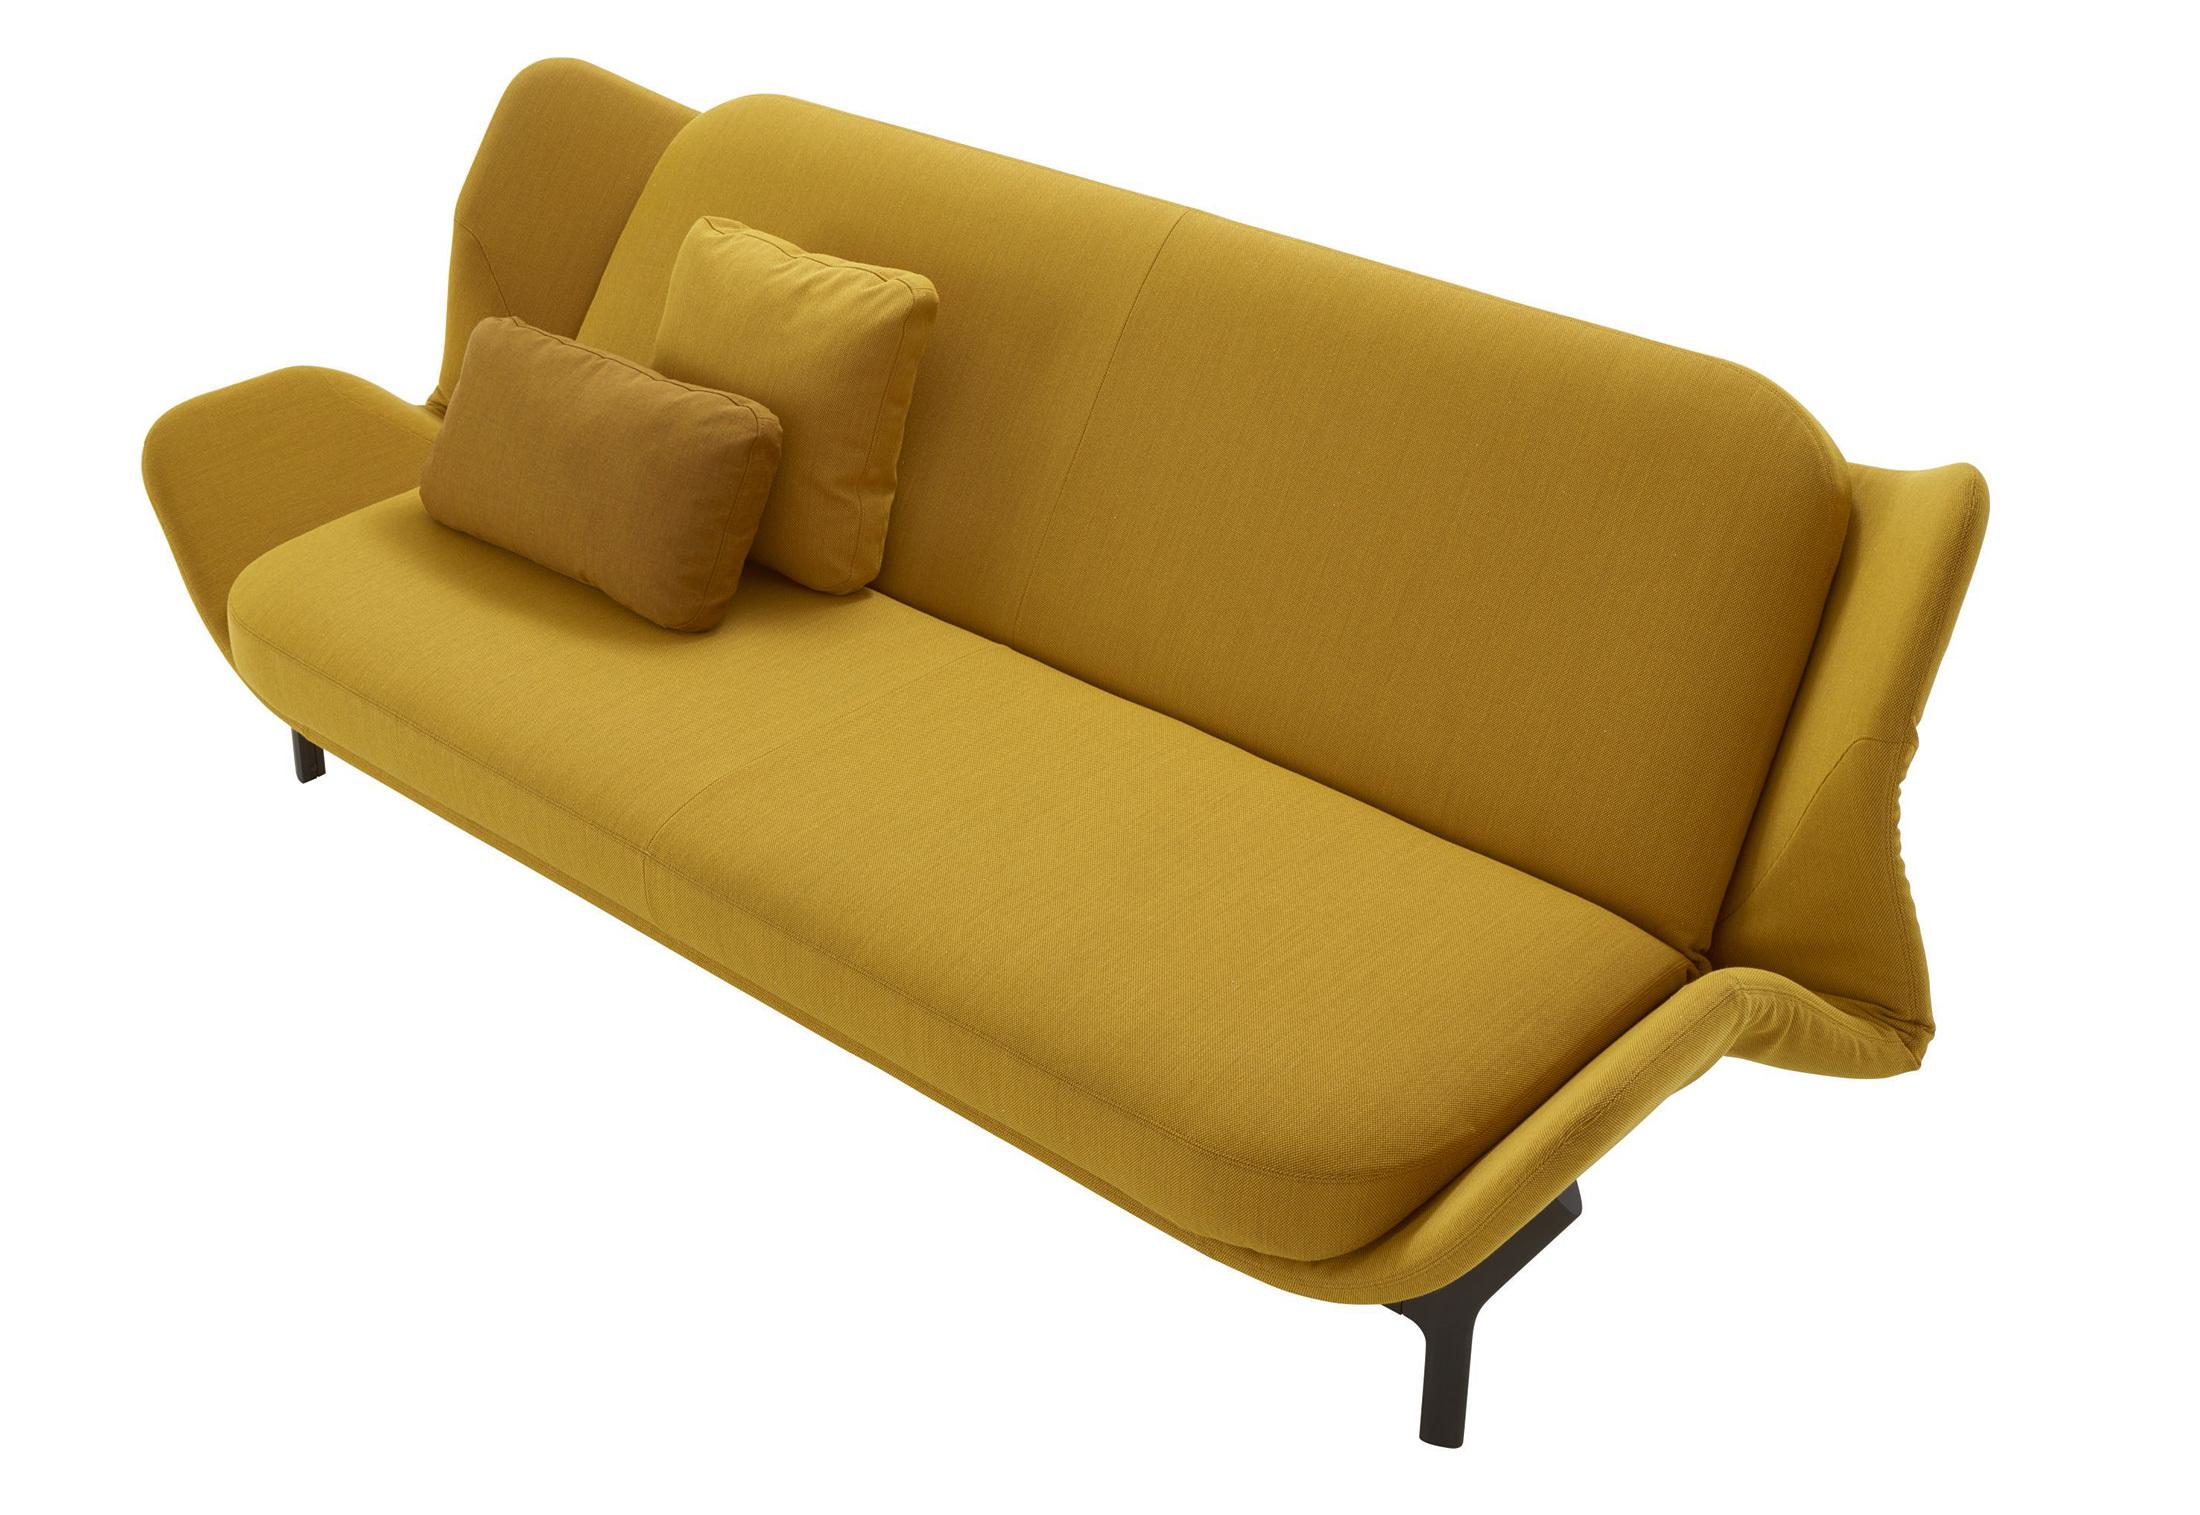 Full Size of Ligne Roset Yang Sofa For Sale Togo Gebraucht Pumpkin Dimensions Furniture Exclusif Feng Multy Bed Ploum Ebay Cover Review Clam Von Stylepark Mit Holzfüßen Sofa Ligne Roset Sofa